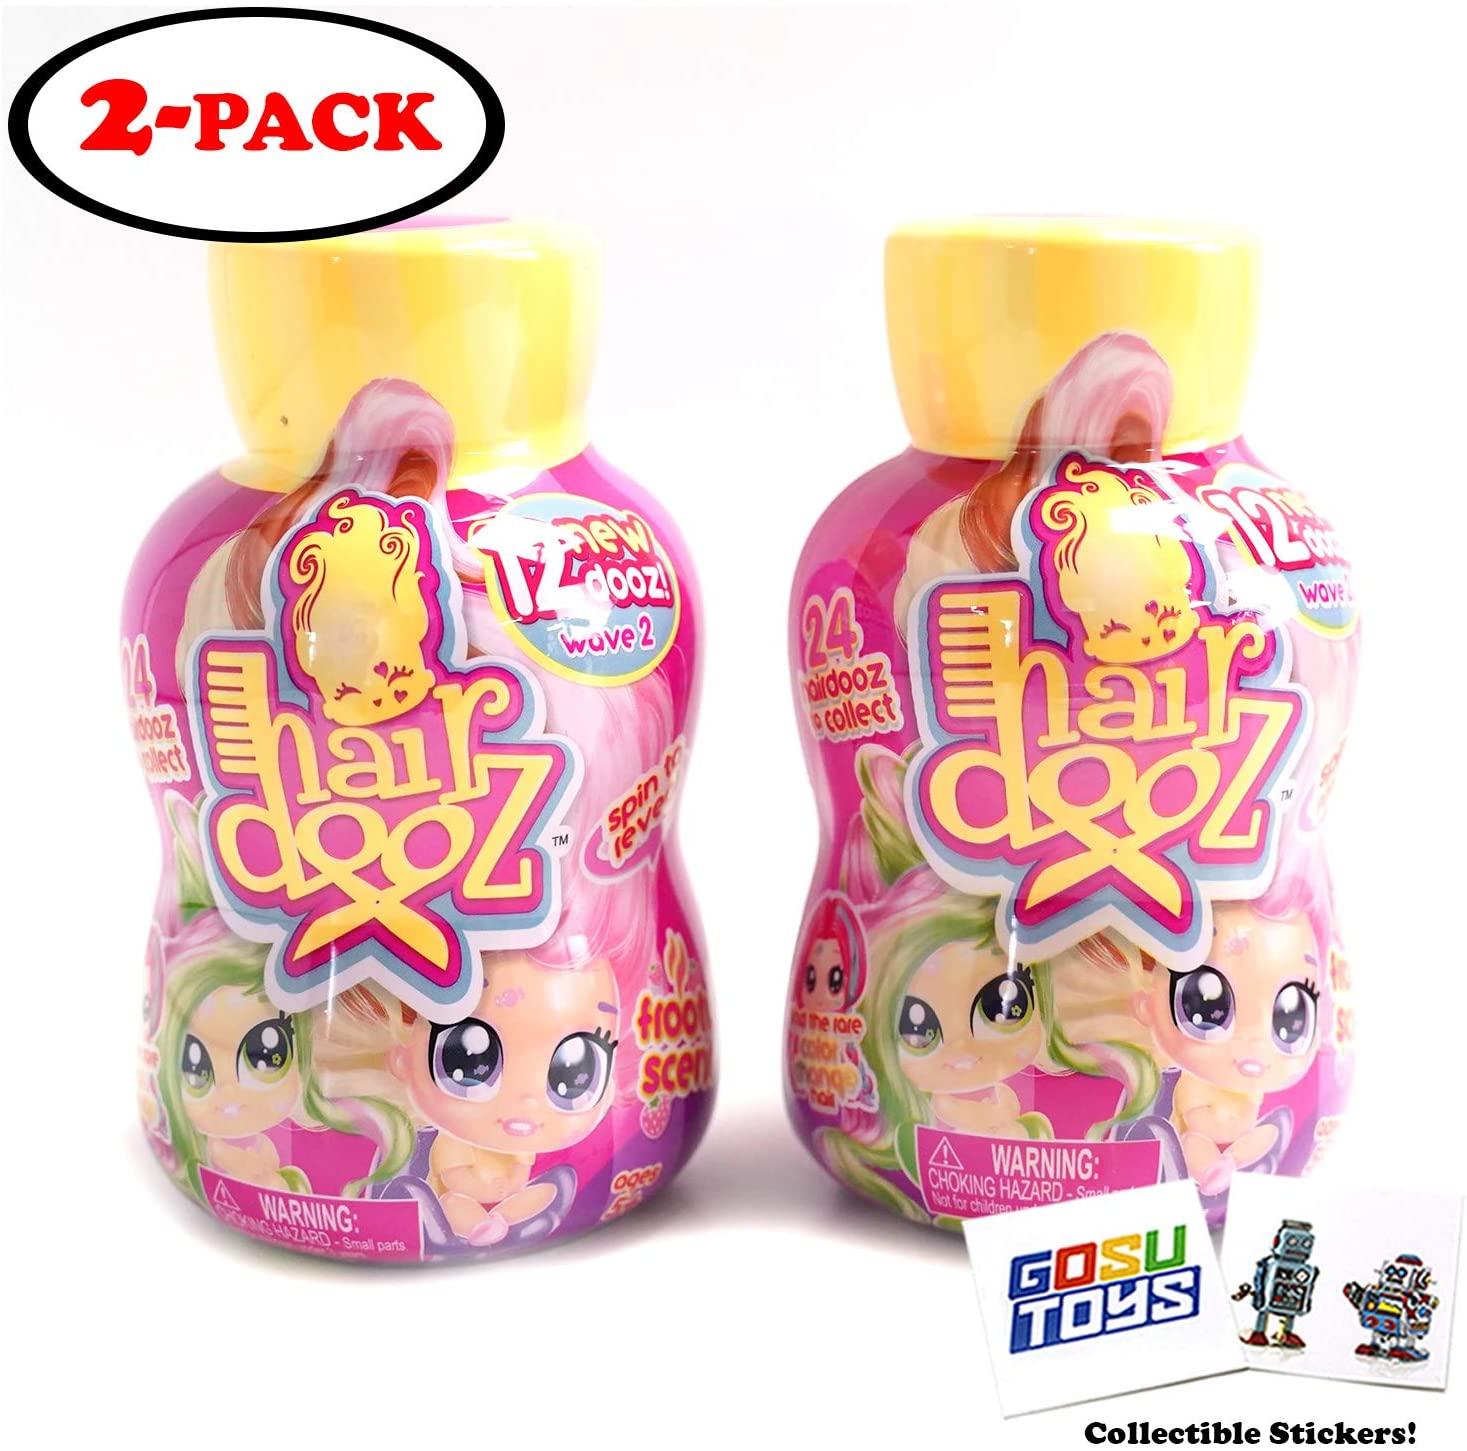 HairDooz Shampoo Bottle Scented Hair Dooz Salon Hairdresser Doll (2 Pack) Wave 2 with 2 GosuToys Stickers